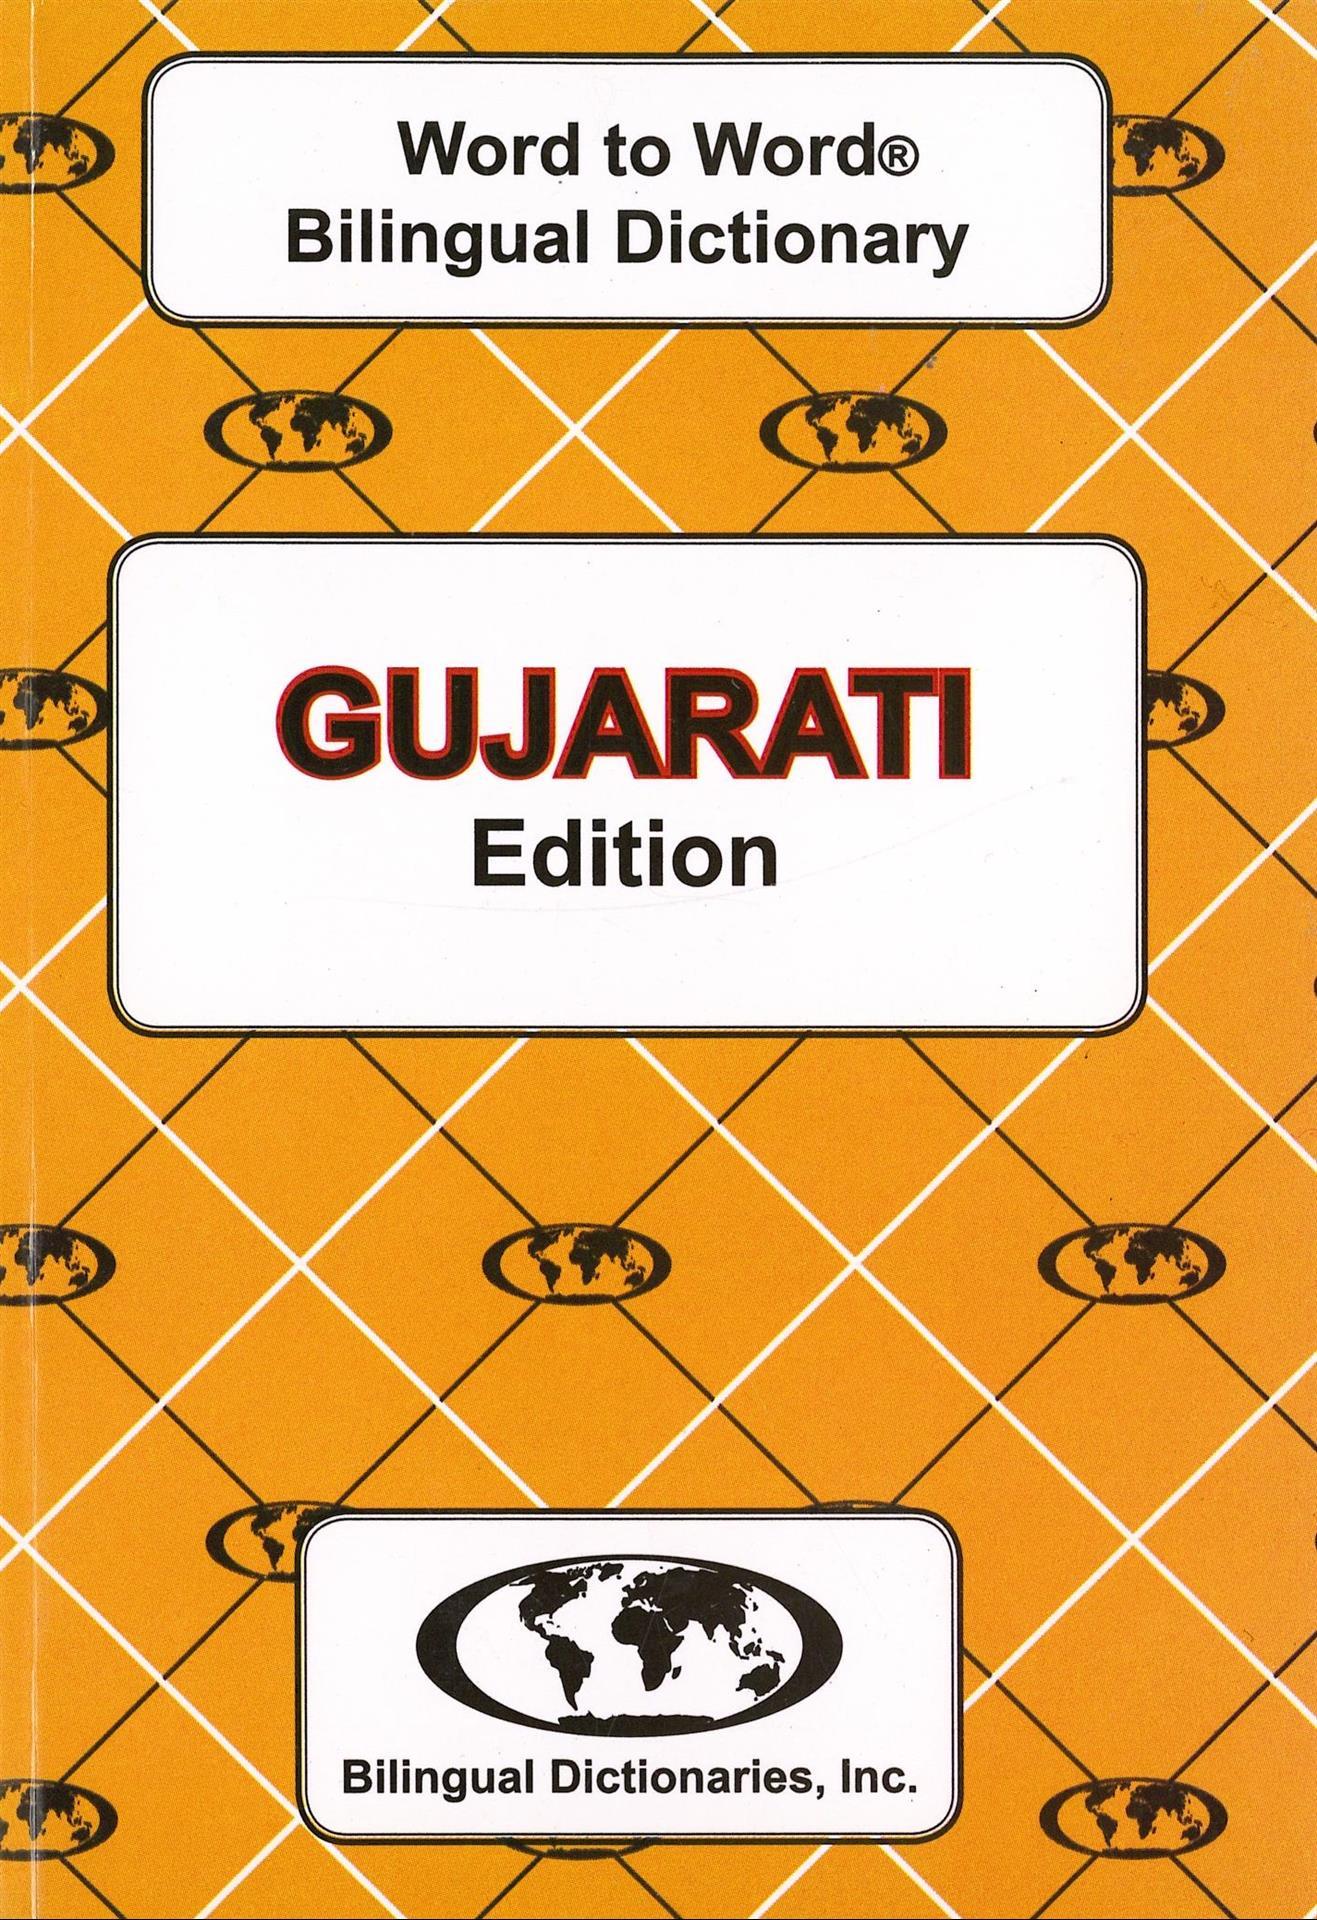 GUJARATI Word to Word Bilingual Dictionary